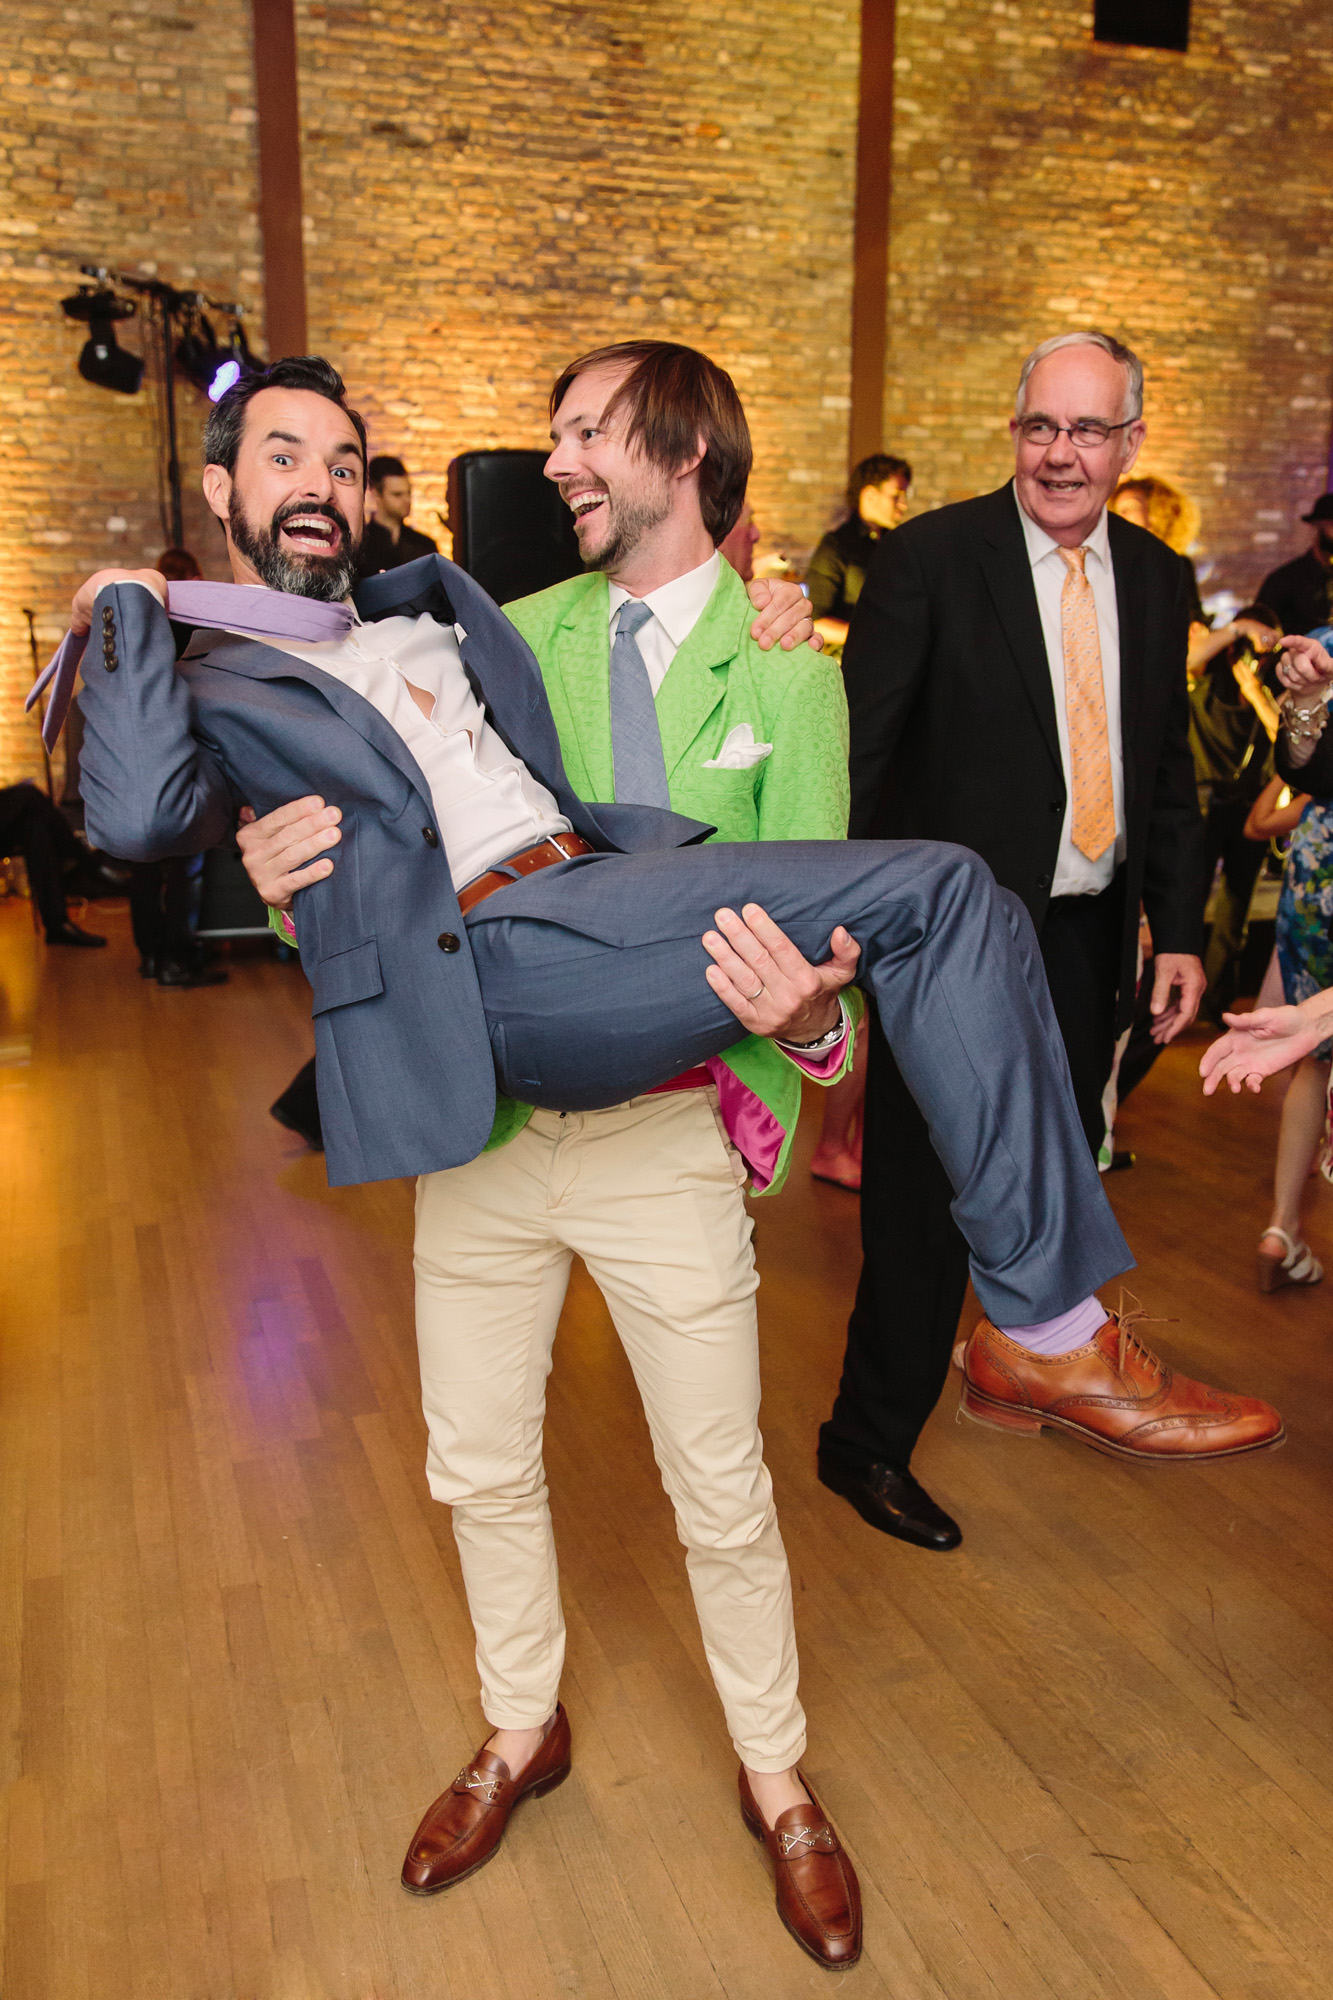 75_Rowan_Brian_The_Roundhouse_Wedding_Beacon_NY_Tanya_Salazar_Photography_883.jpg